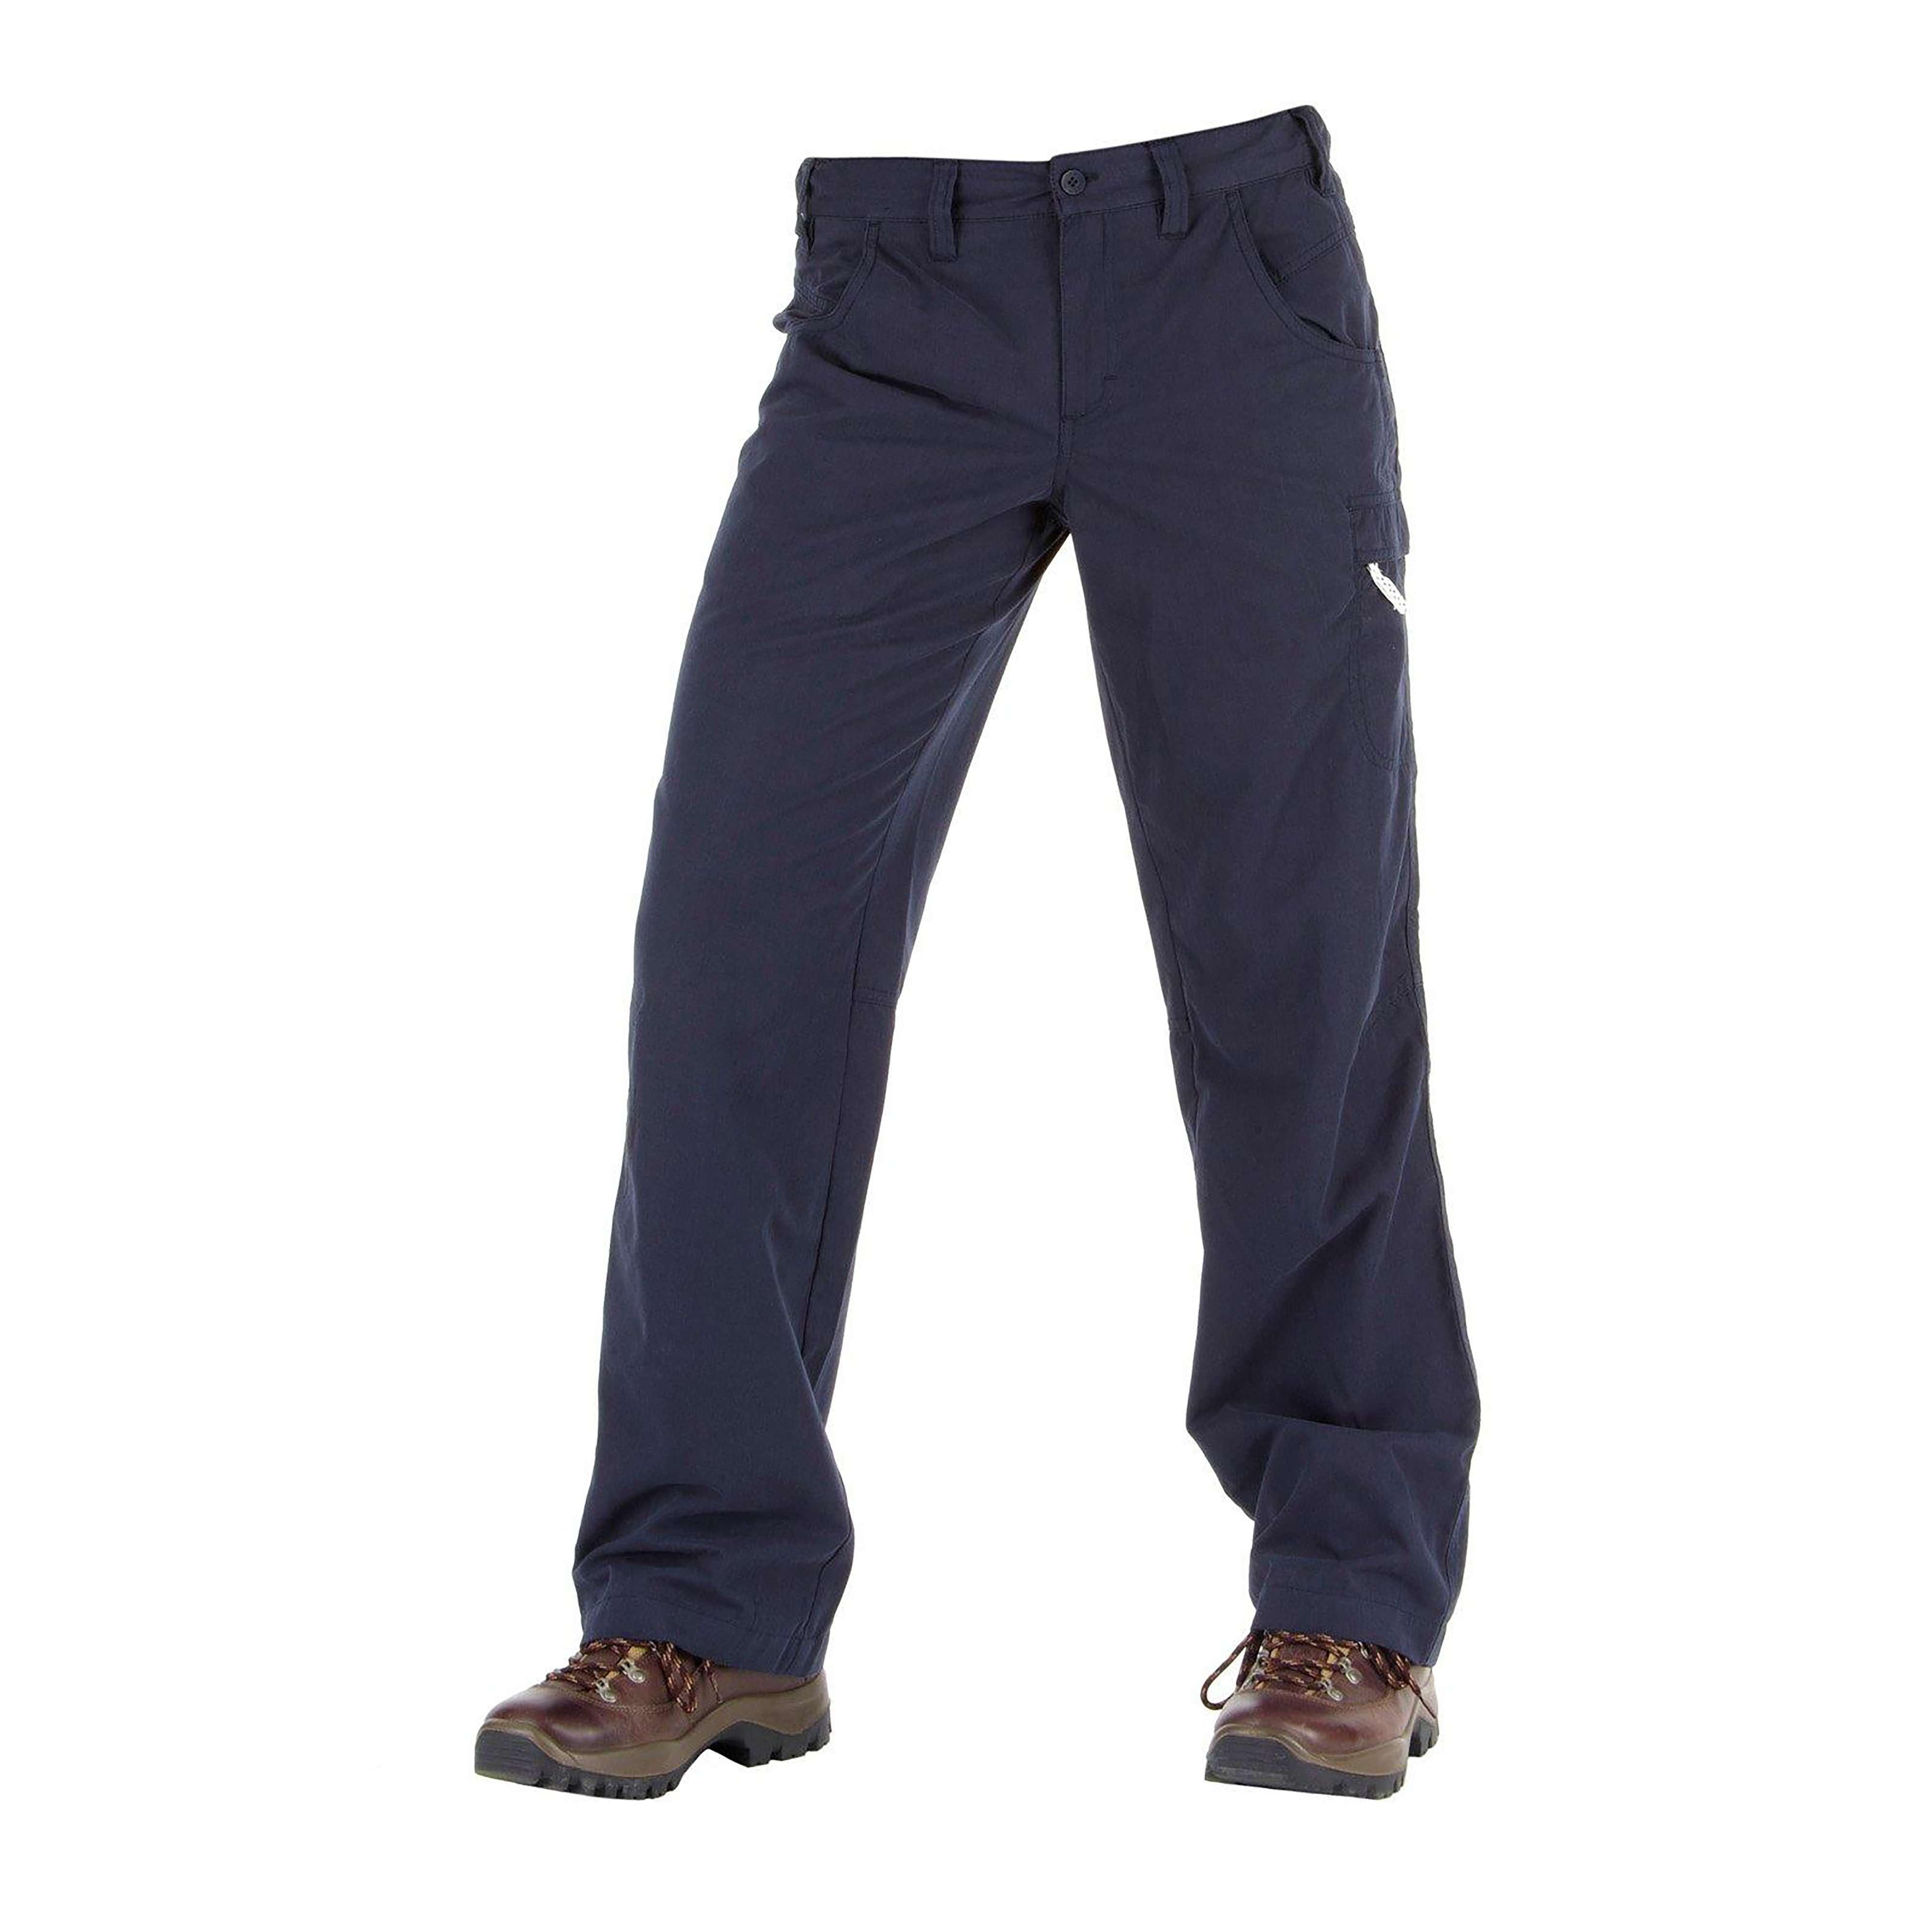 BERGHAUS Women's Navigator Cargo Trousers